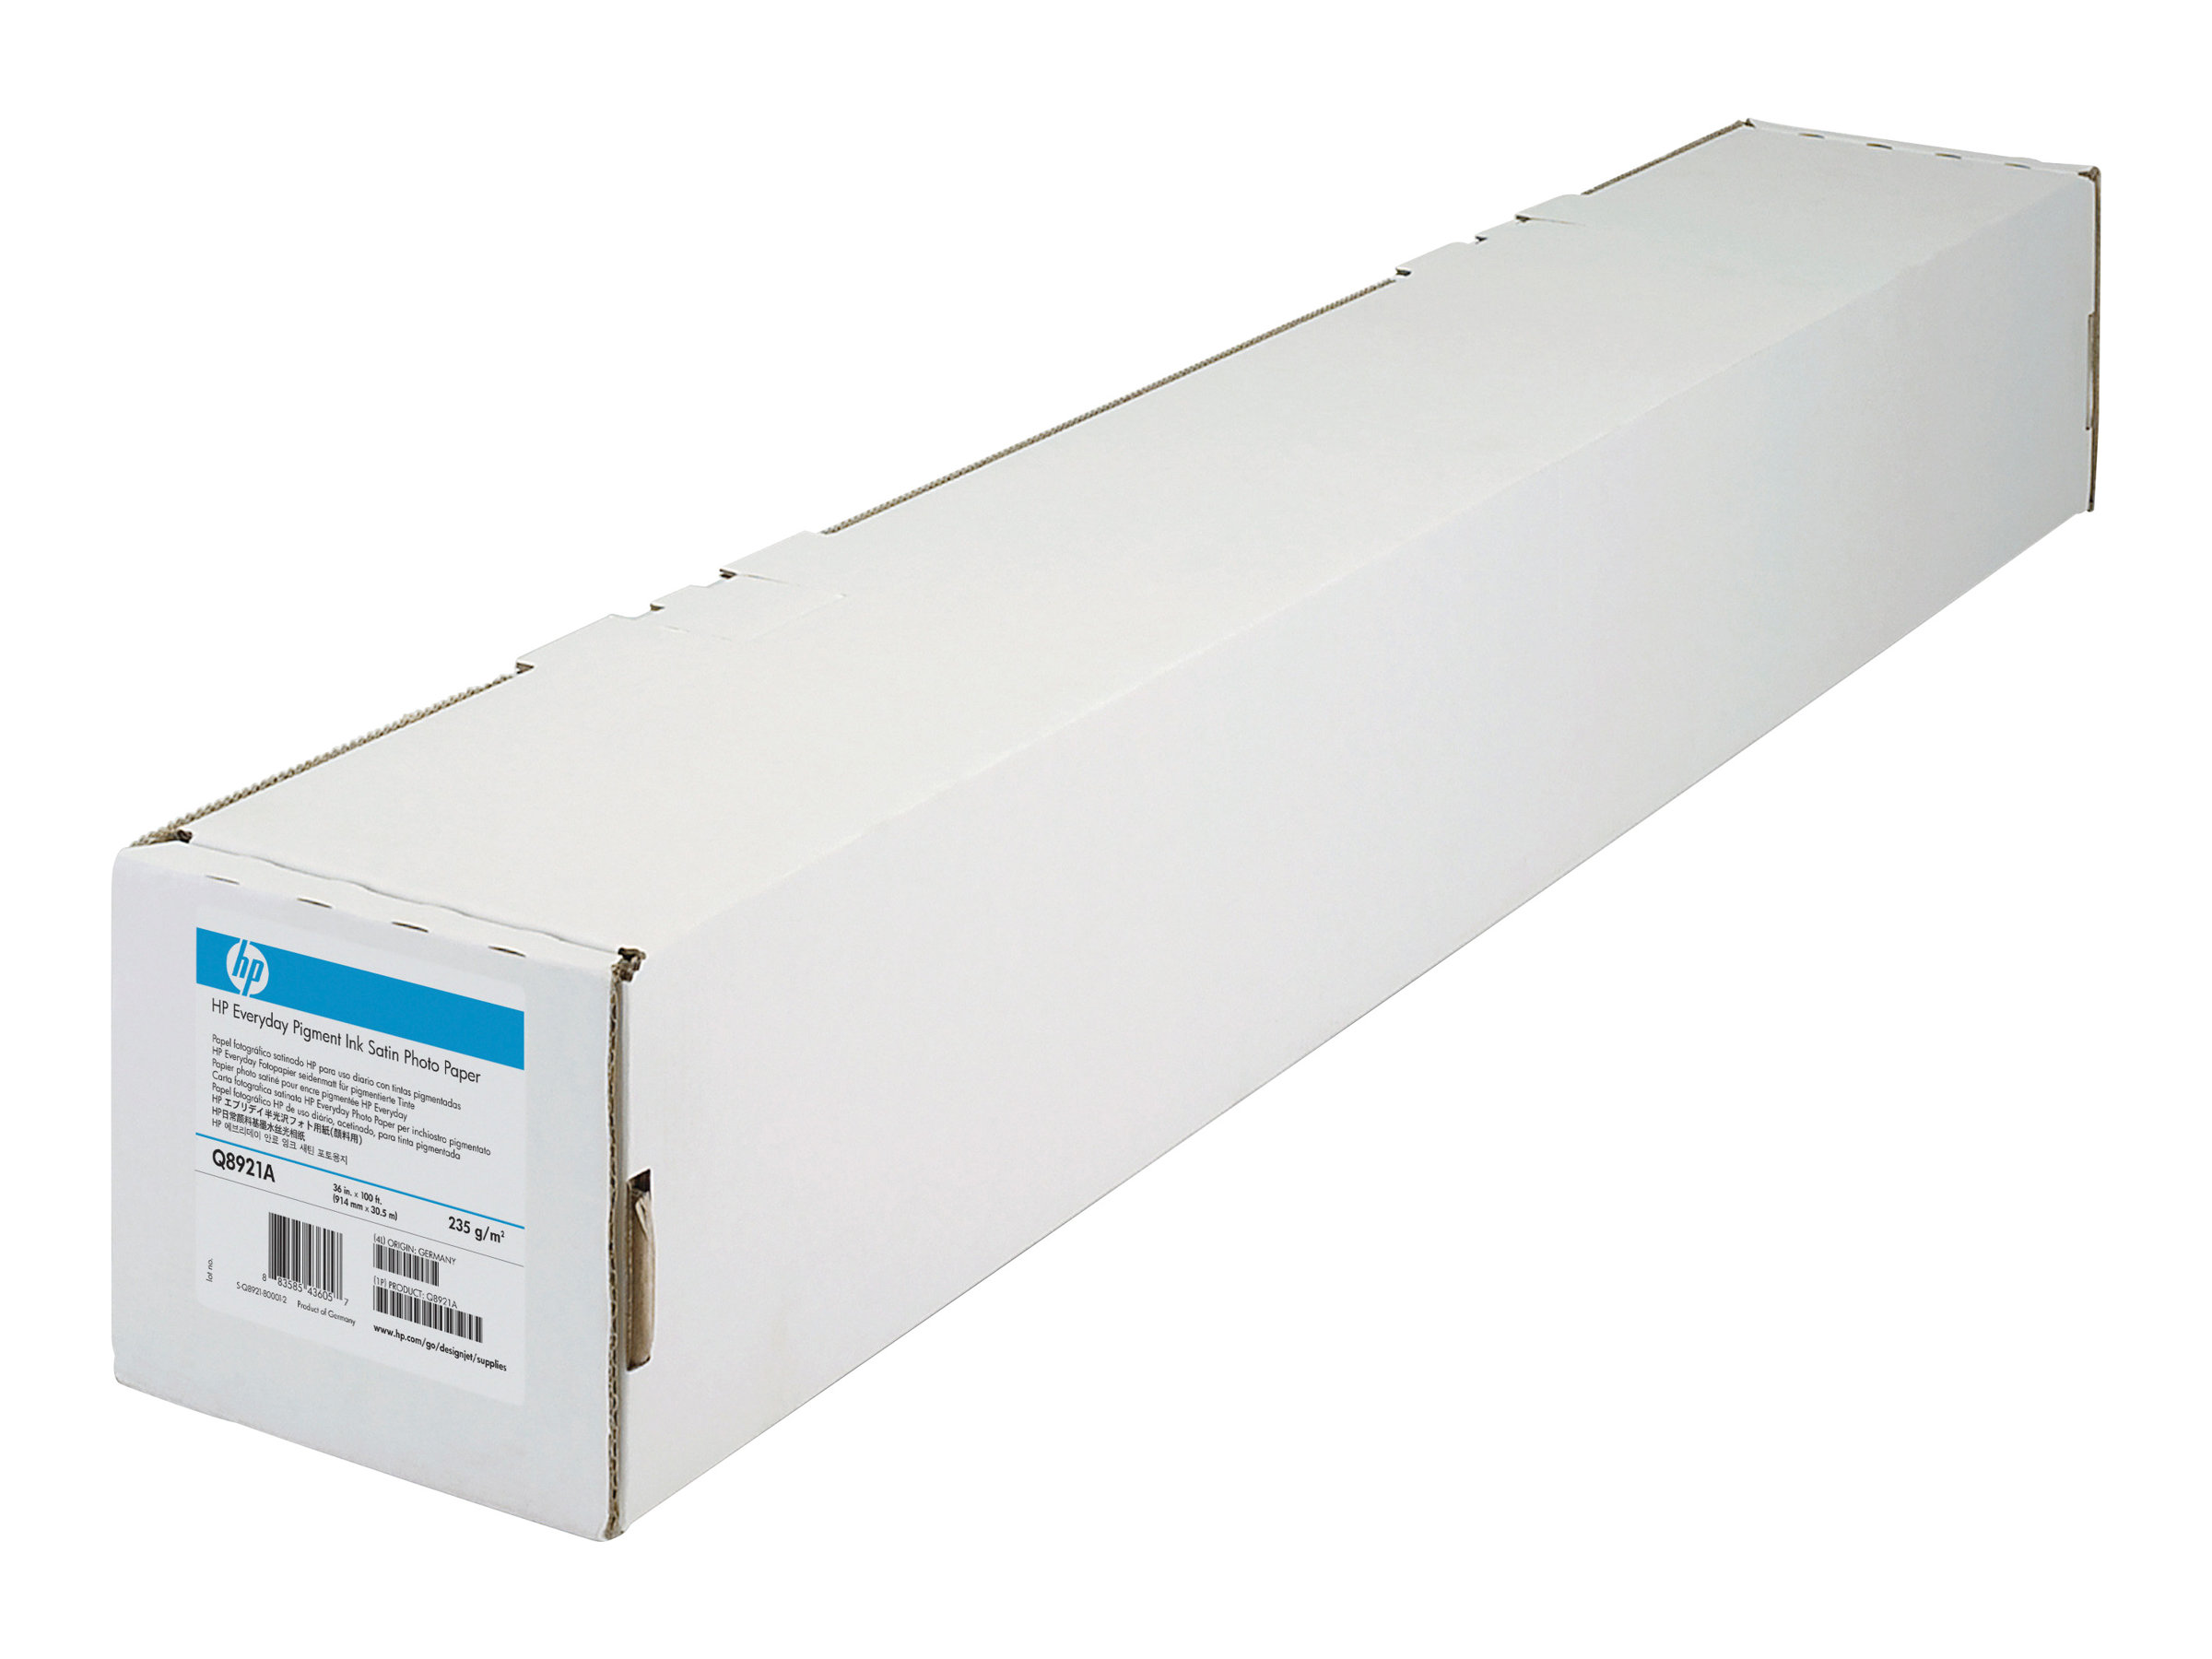 HP Universal - Seidig - Rolle (91,4 cm x 30,5 m) 1 Rolle(n) Fotopapier